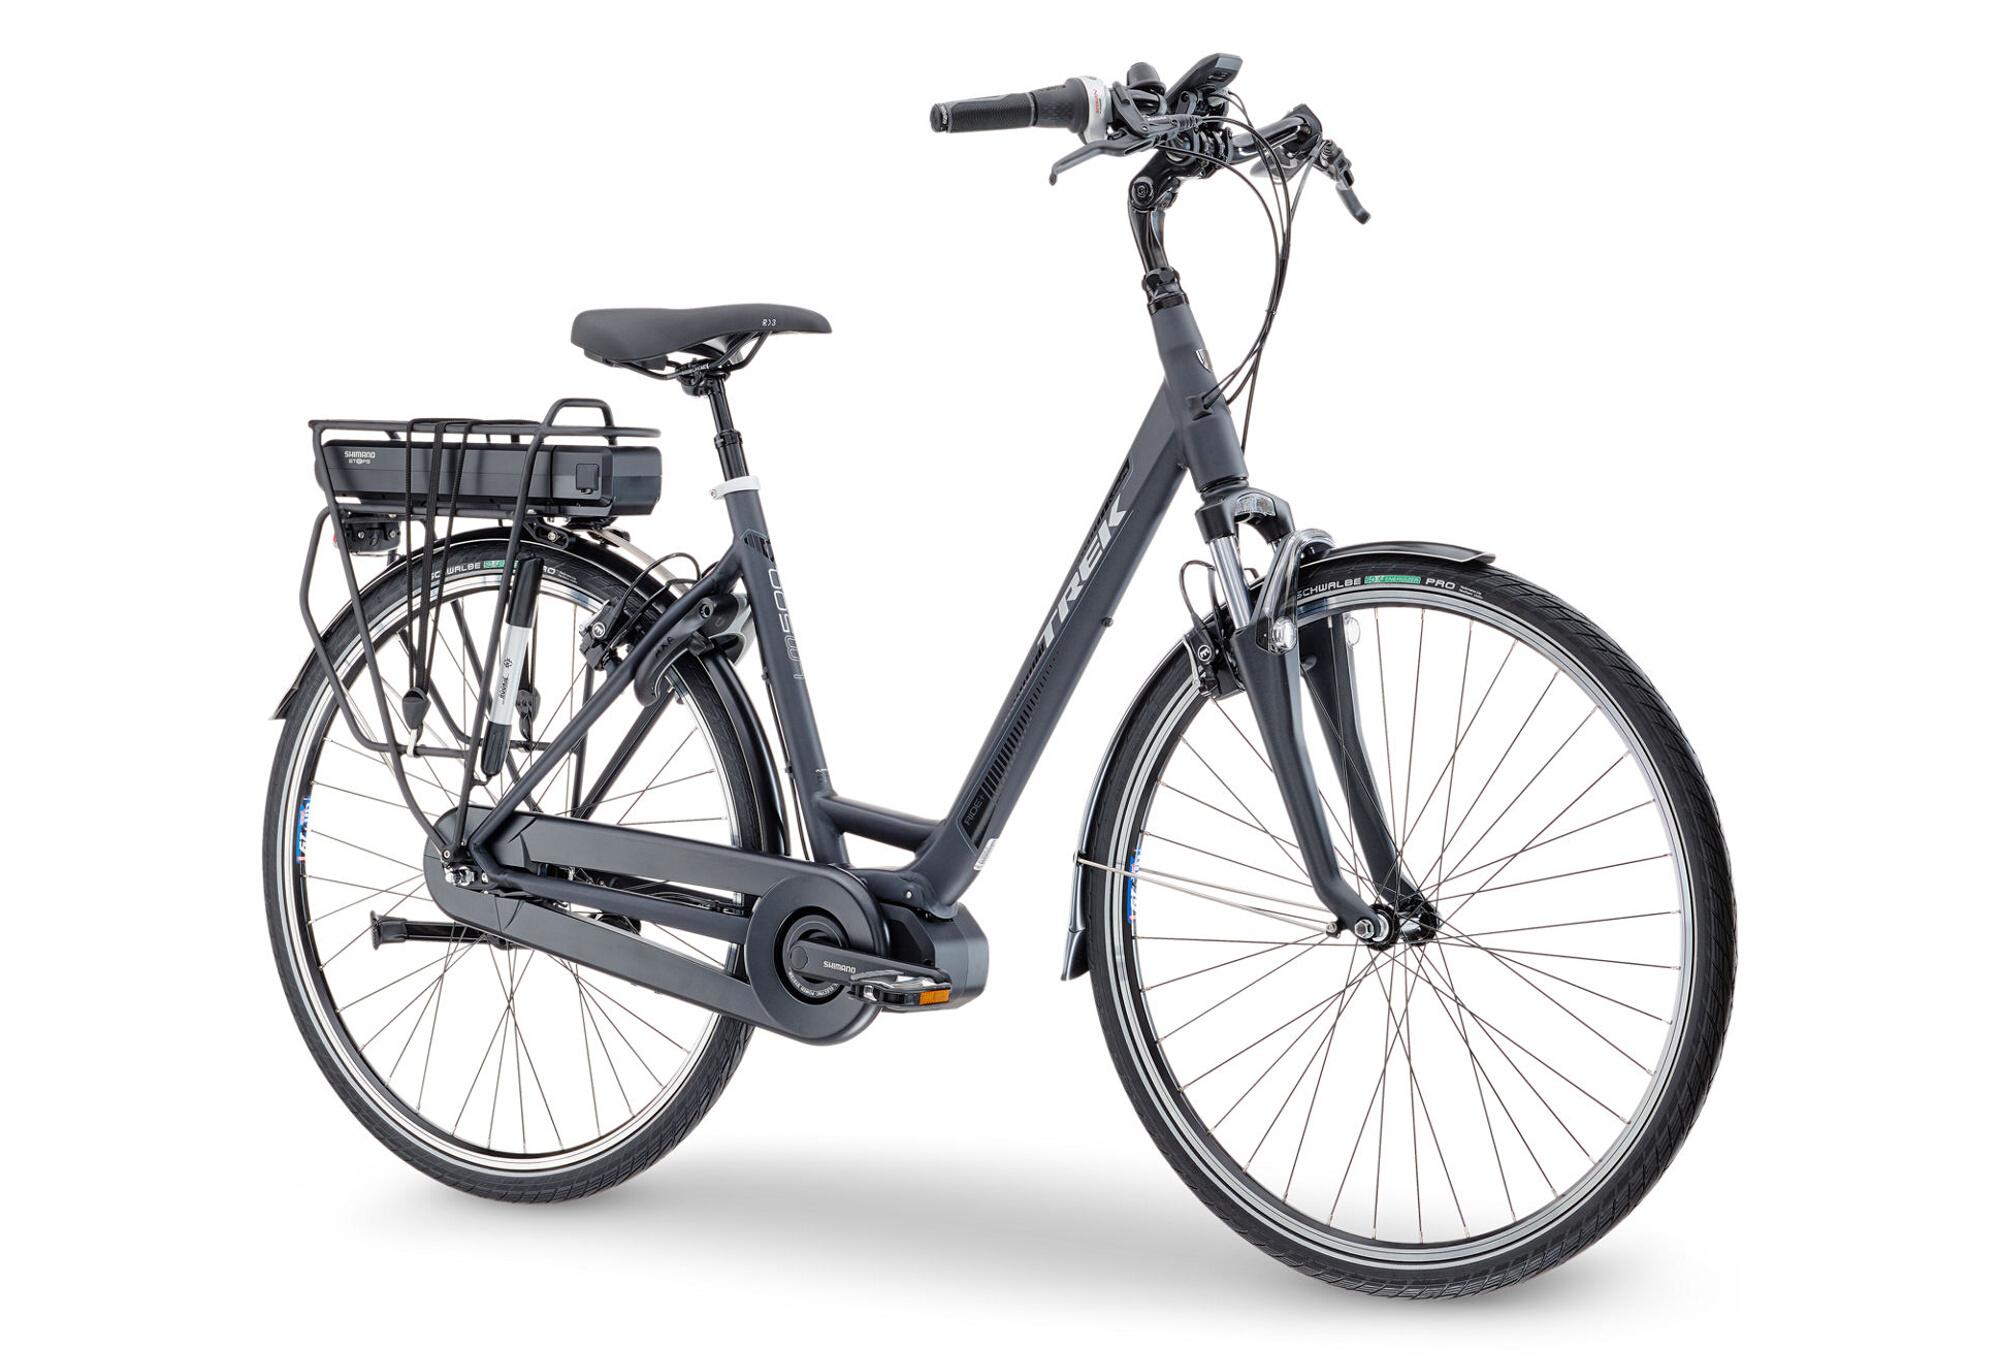 trek lm500 lowstep women urban e bike shimano nexus 8s. Black Bedroom Furniture Sets. Home Design Ideas